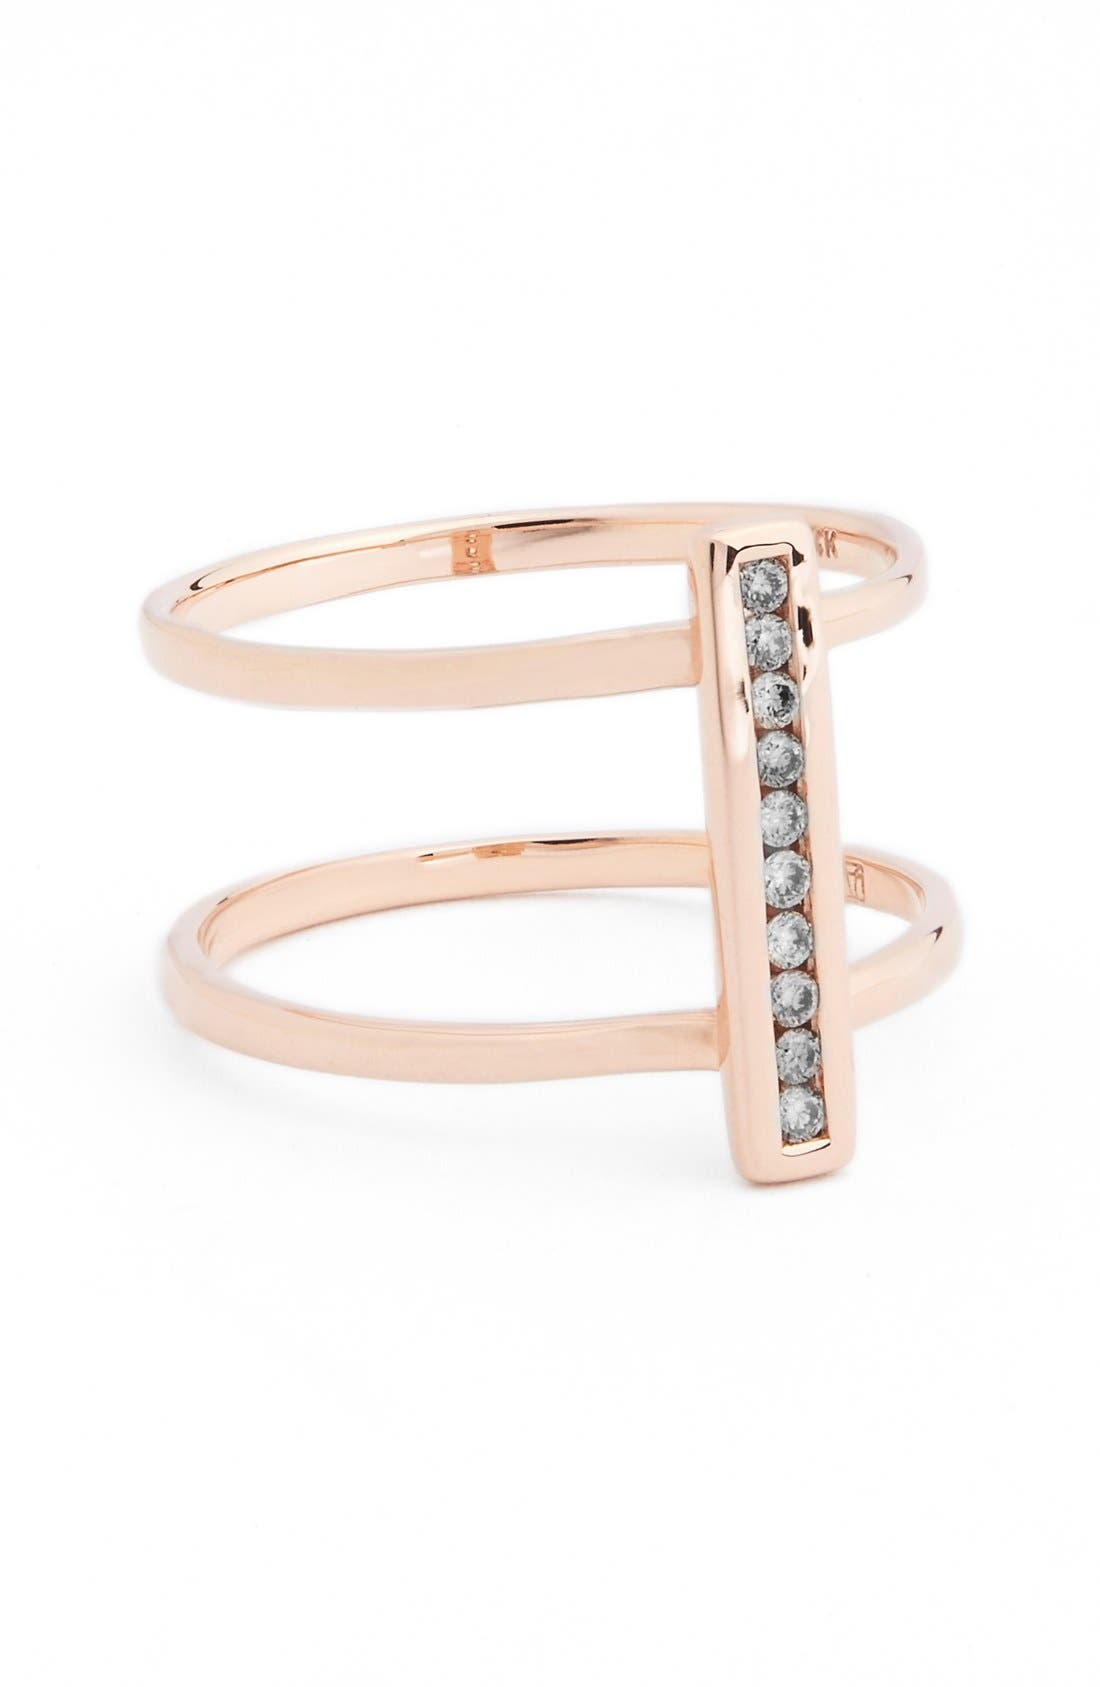 Main Image - Anna Sheffield 'Licol' Diamond Bar Ring